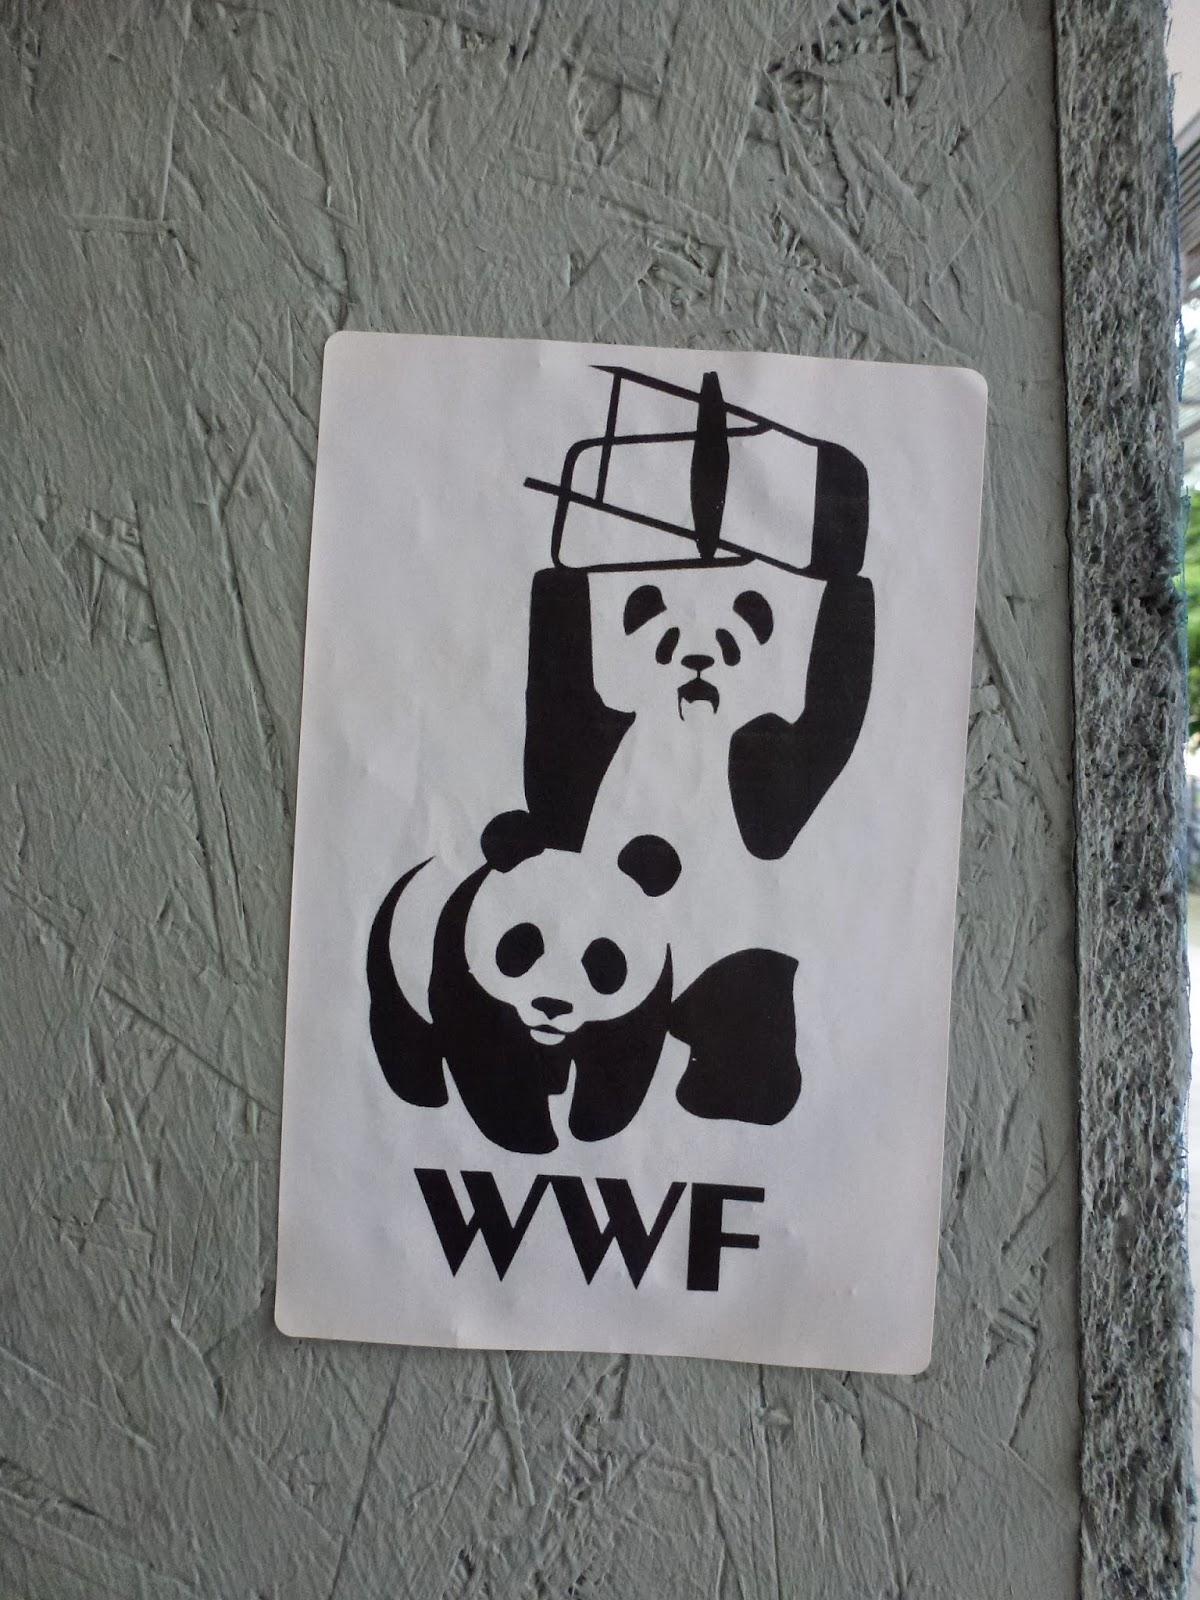 Streetart, Sticker, Urbanart